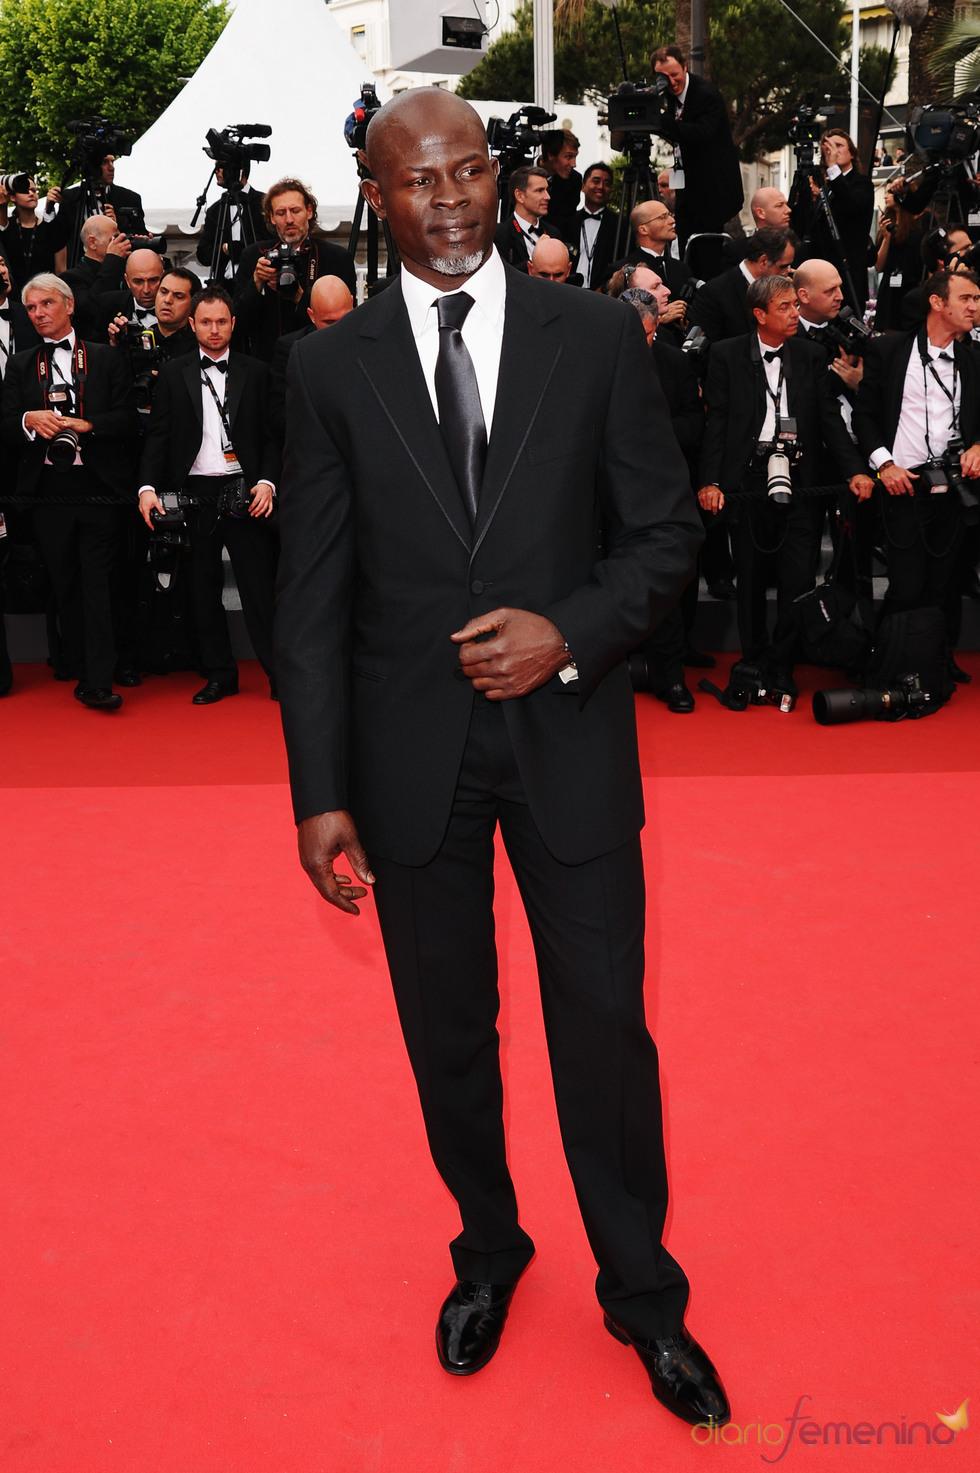 Djimon Hounsou posa en la alfombra roja del Festival de Cine de Cannes 2011